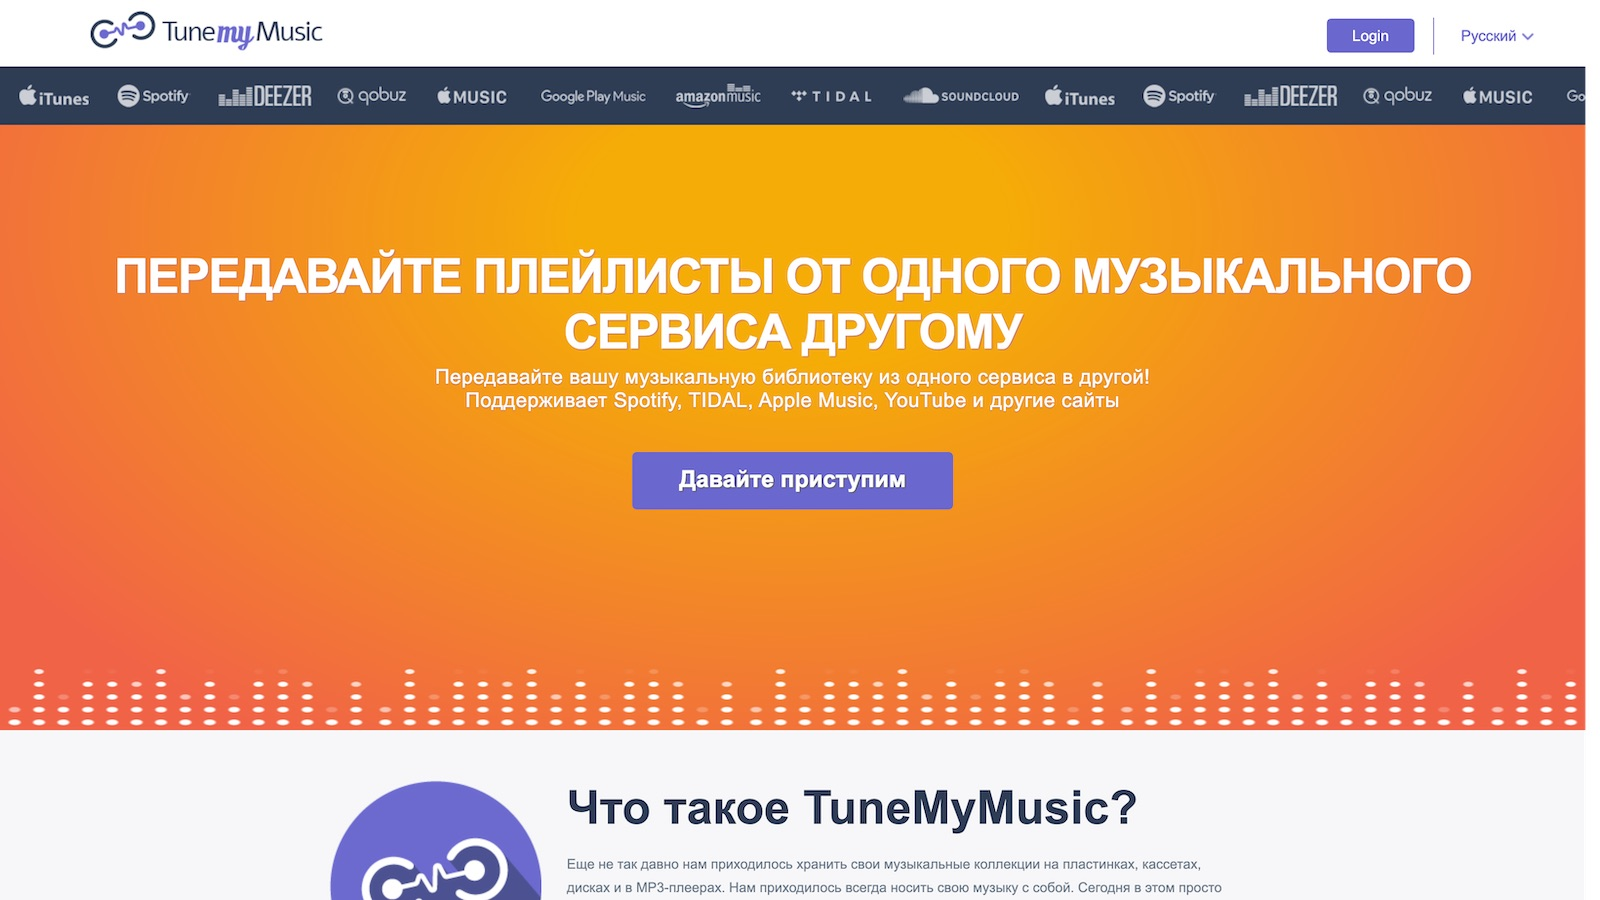 Как перенести плейлист в Spotify через Tune My Music